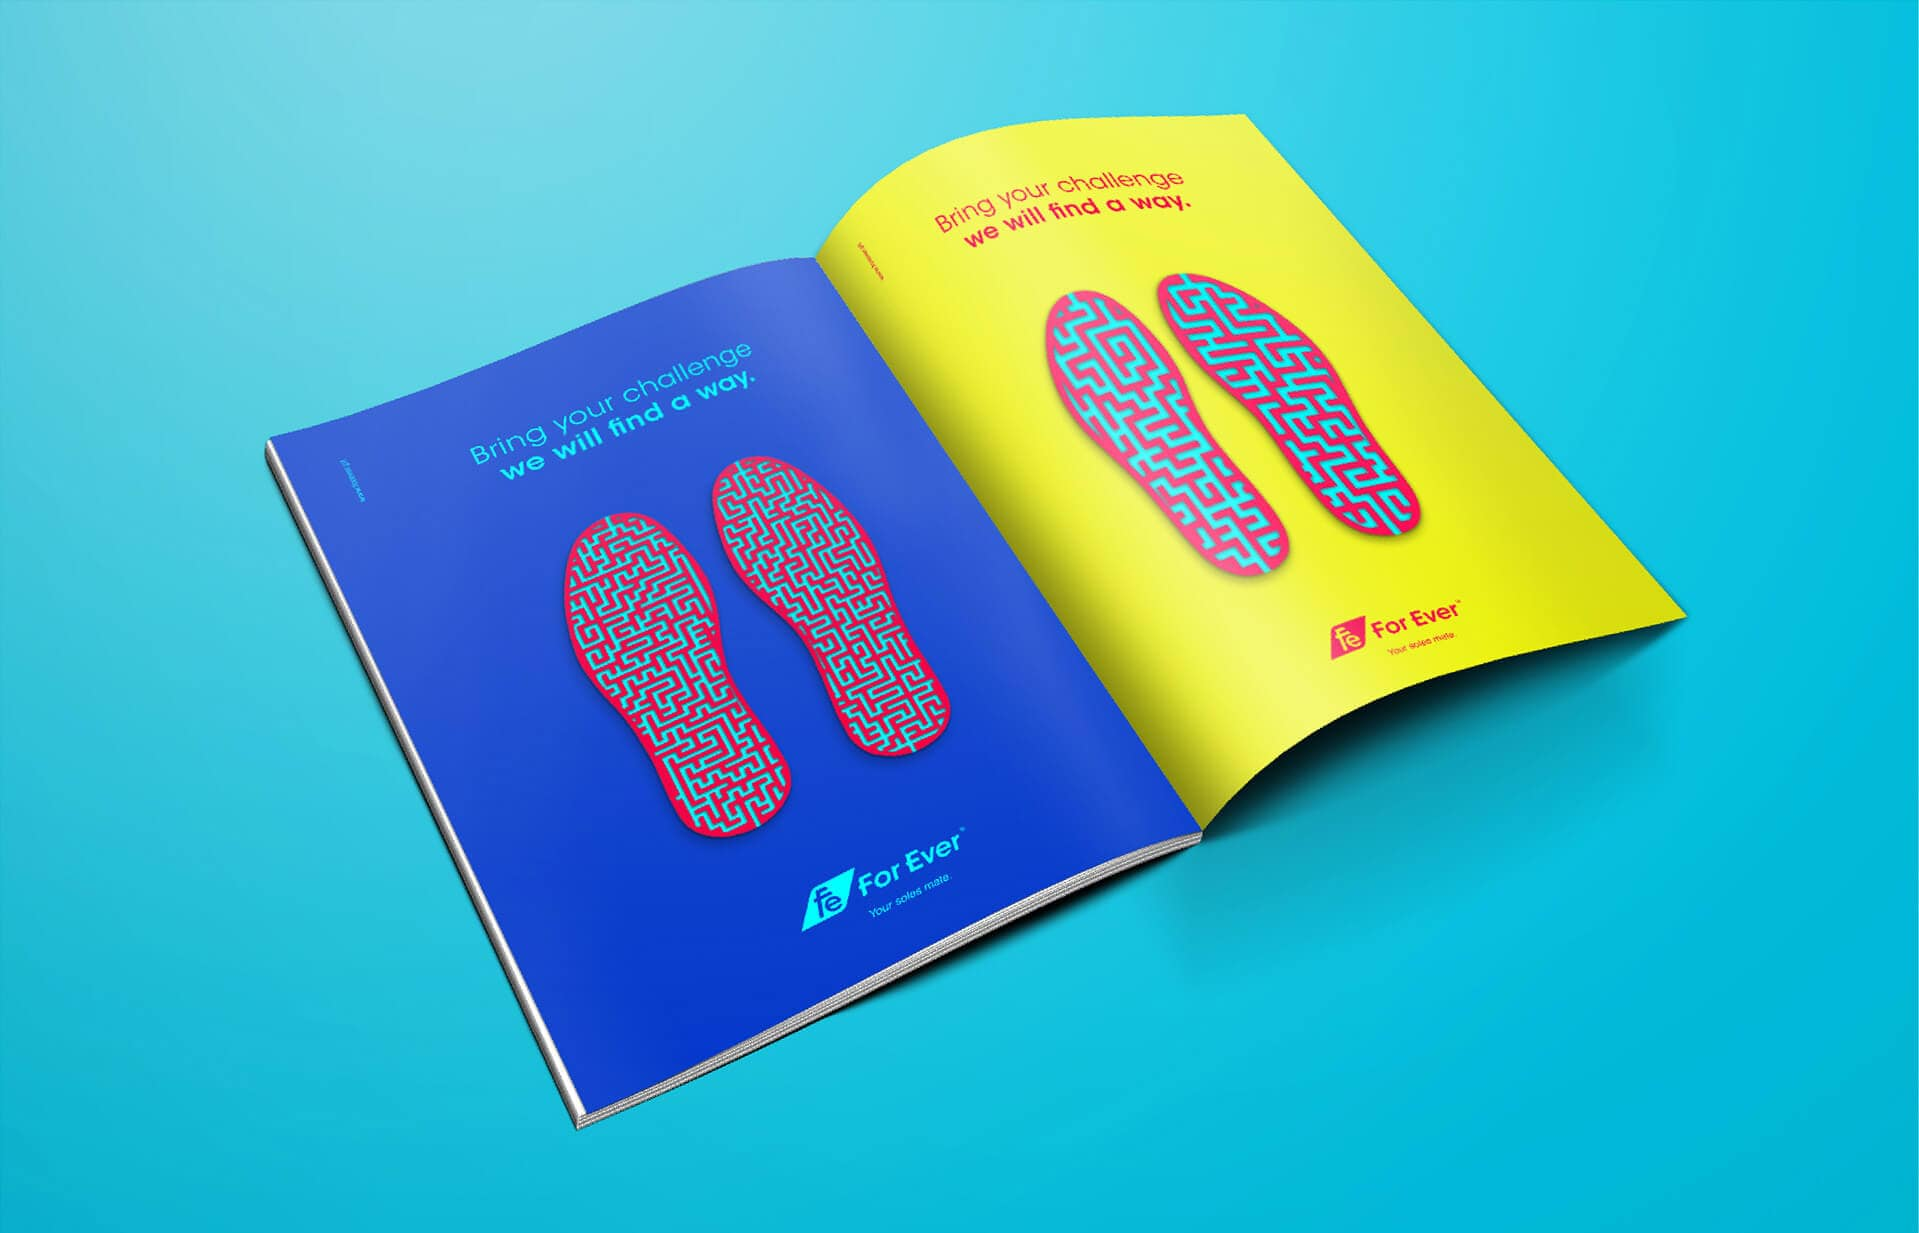 Footwear, soles, branding, industry, manufacture, factory, stationary, design, web, marketing